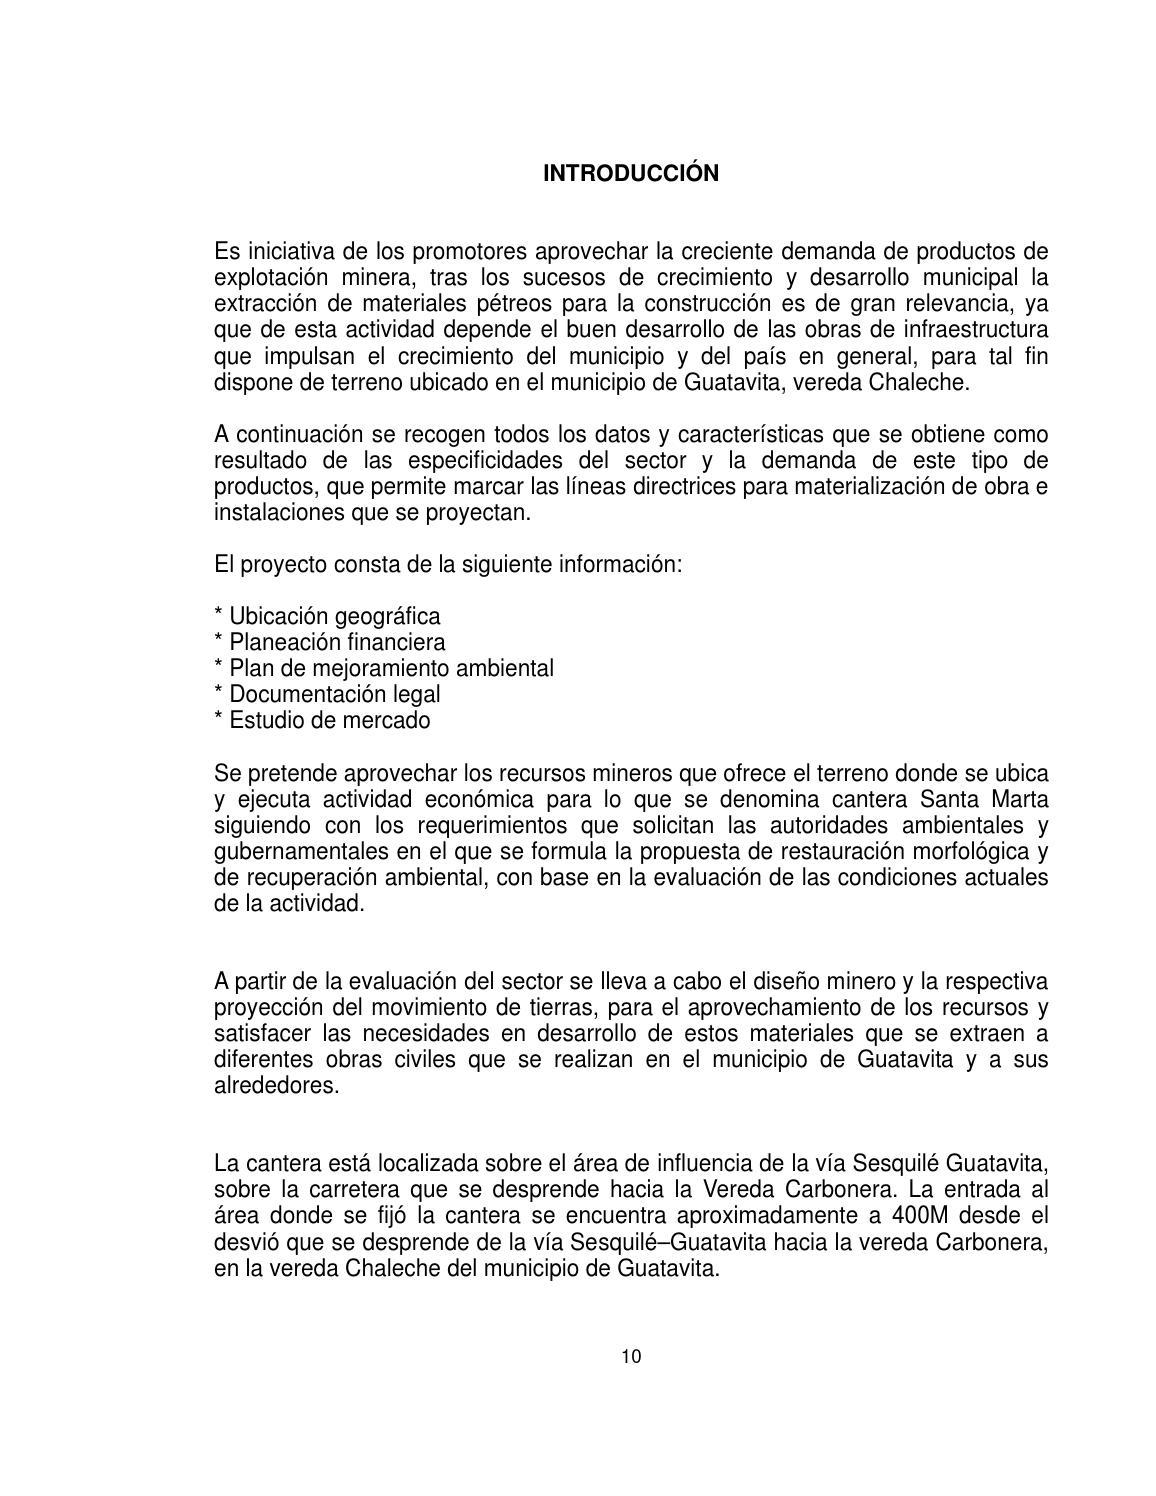 Tesis 0644 adm by maosabo issuu for De donde se extrae el marmol